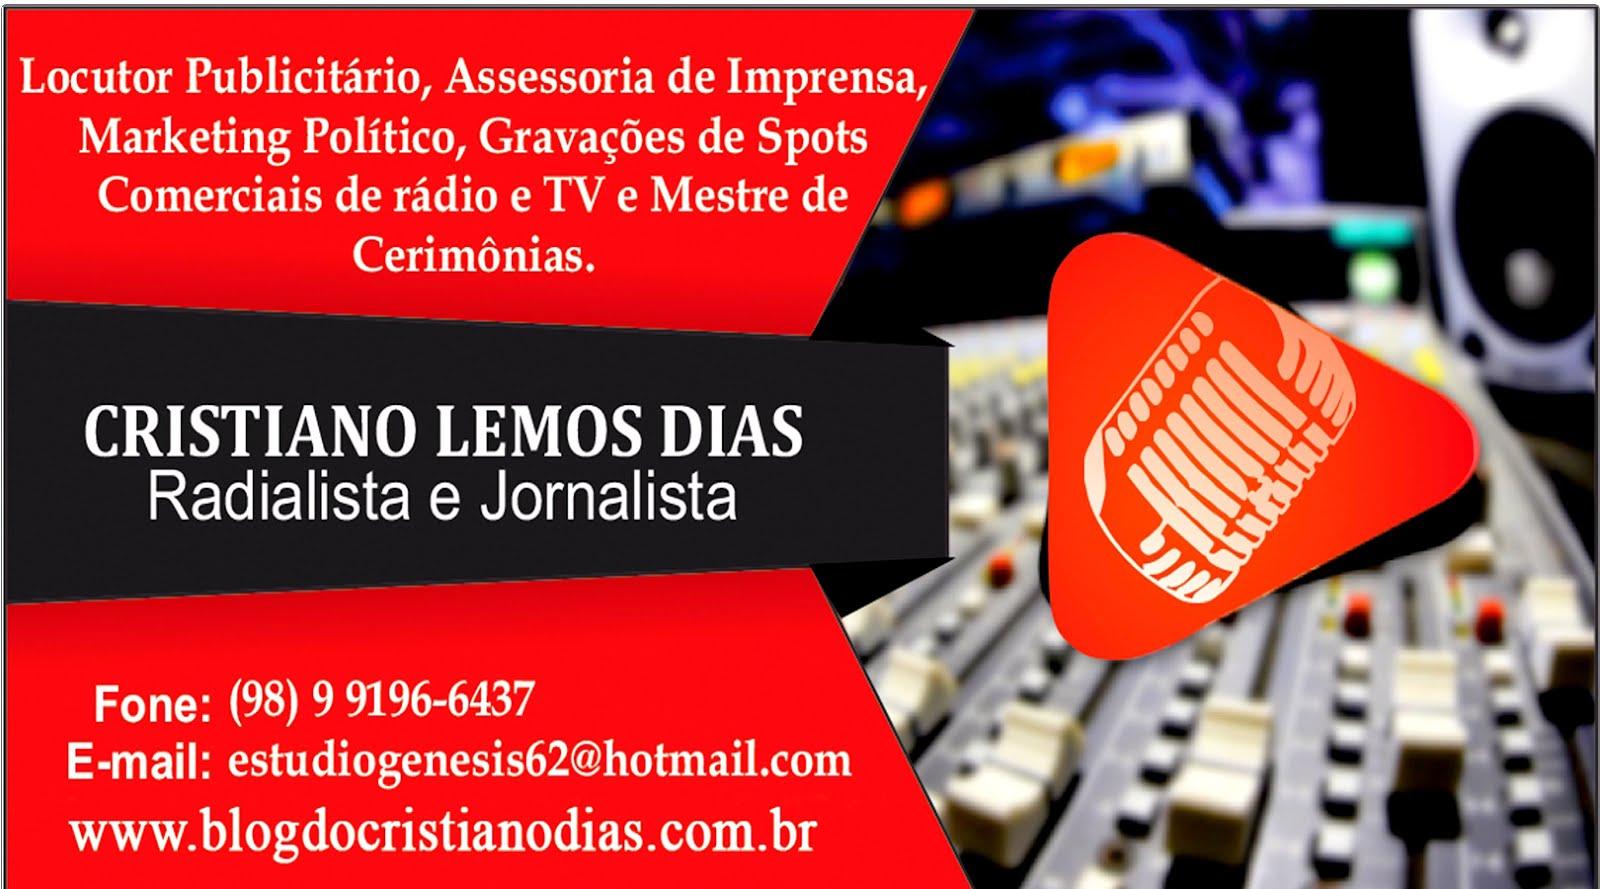 PUBLICIDADE/CRISTIANO DIAS